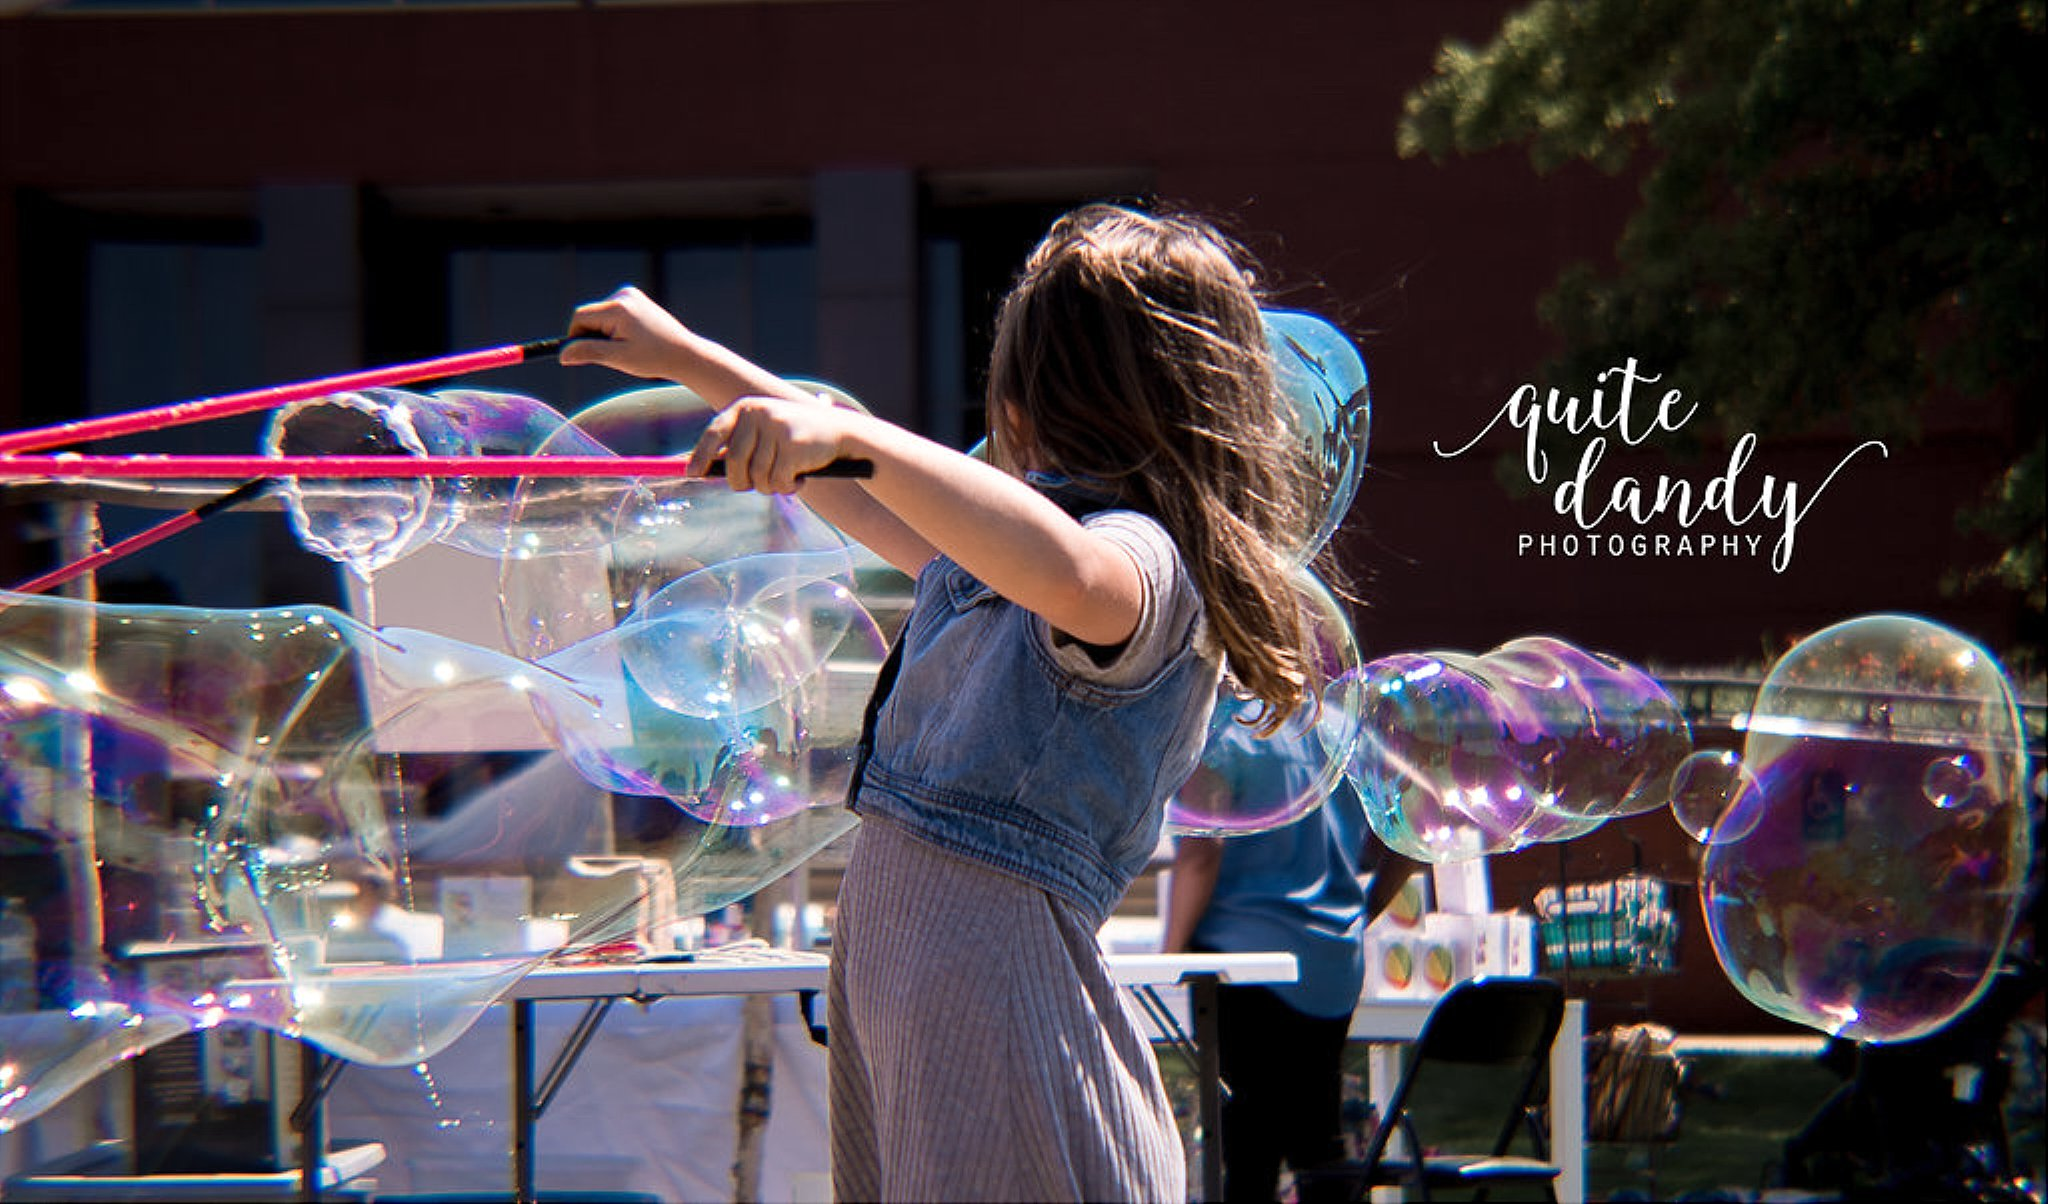 2017 Big Latch On, quite dandy photography, joyful bubbles